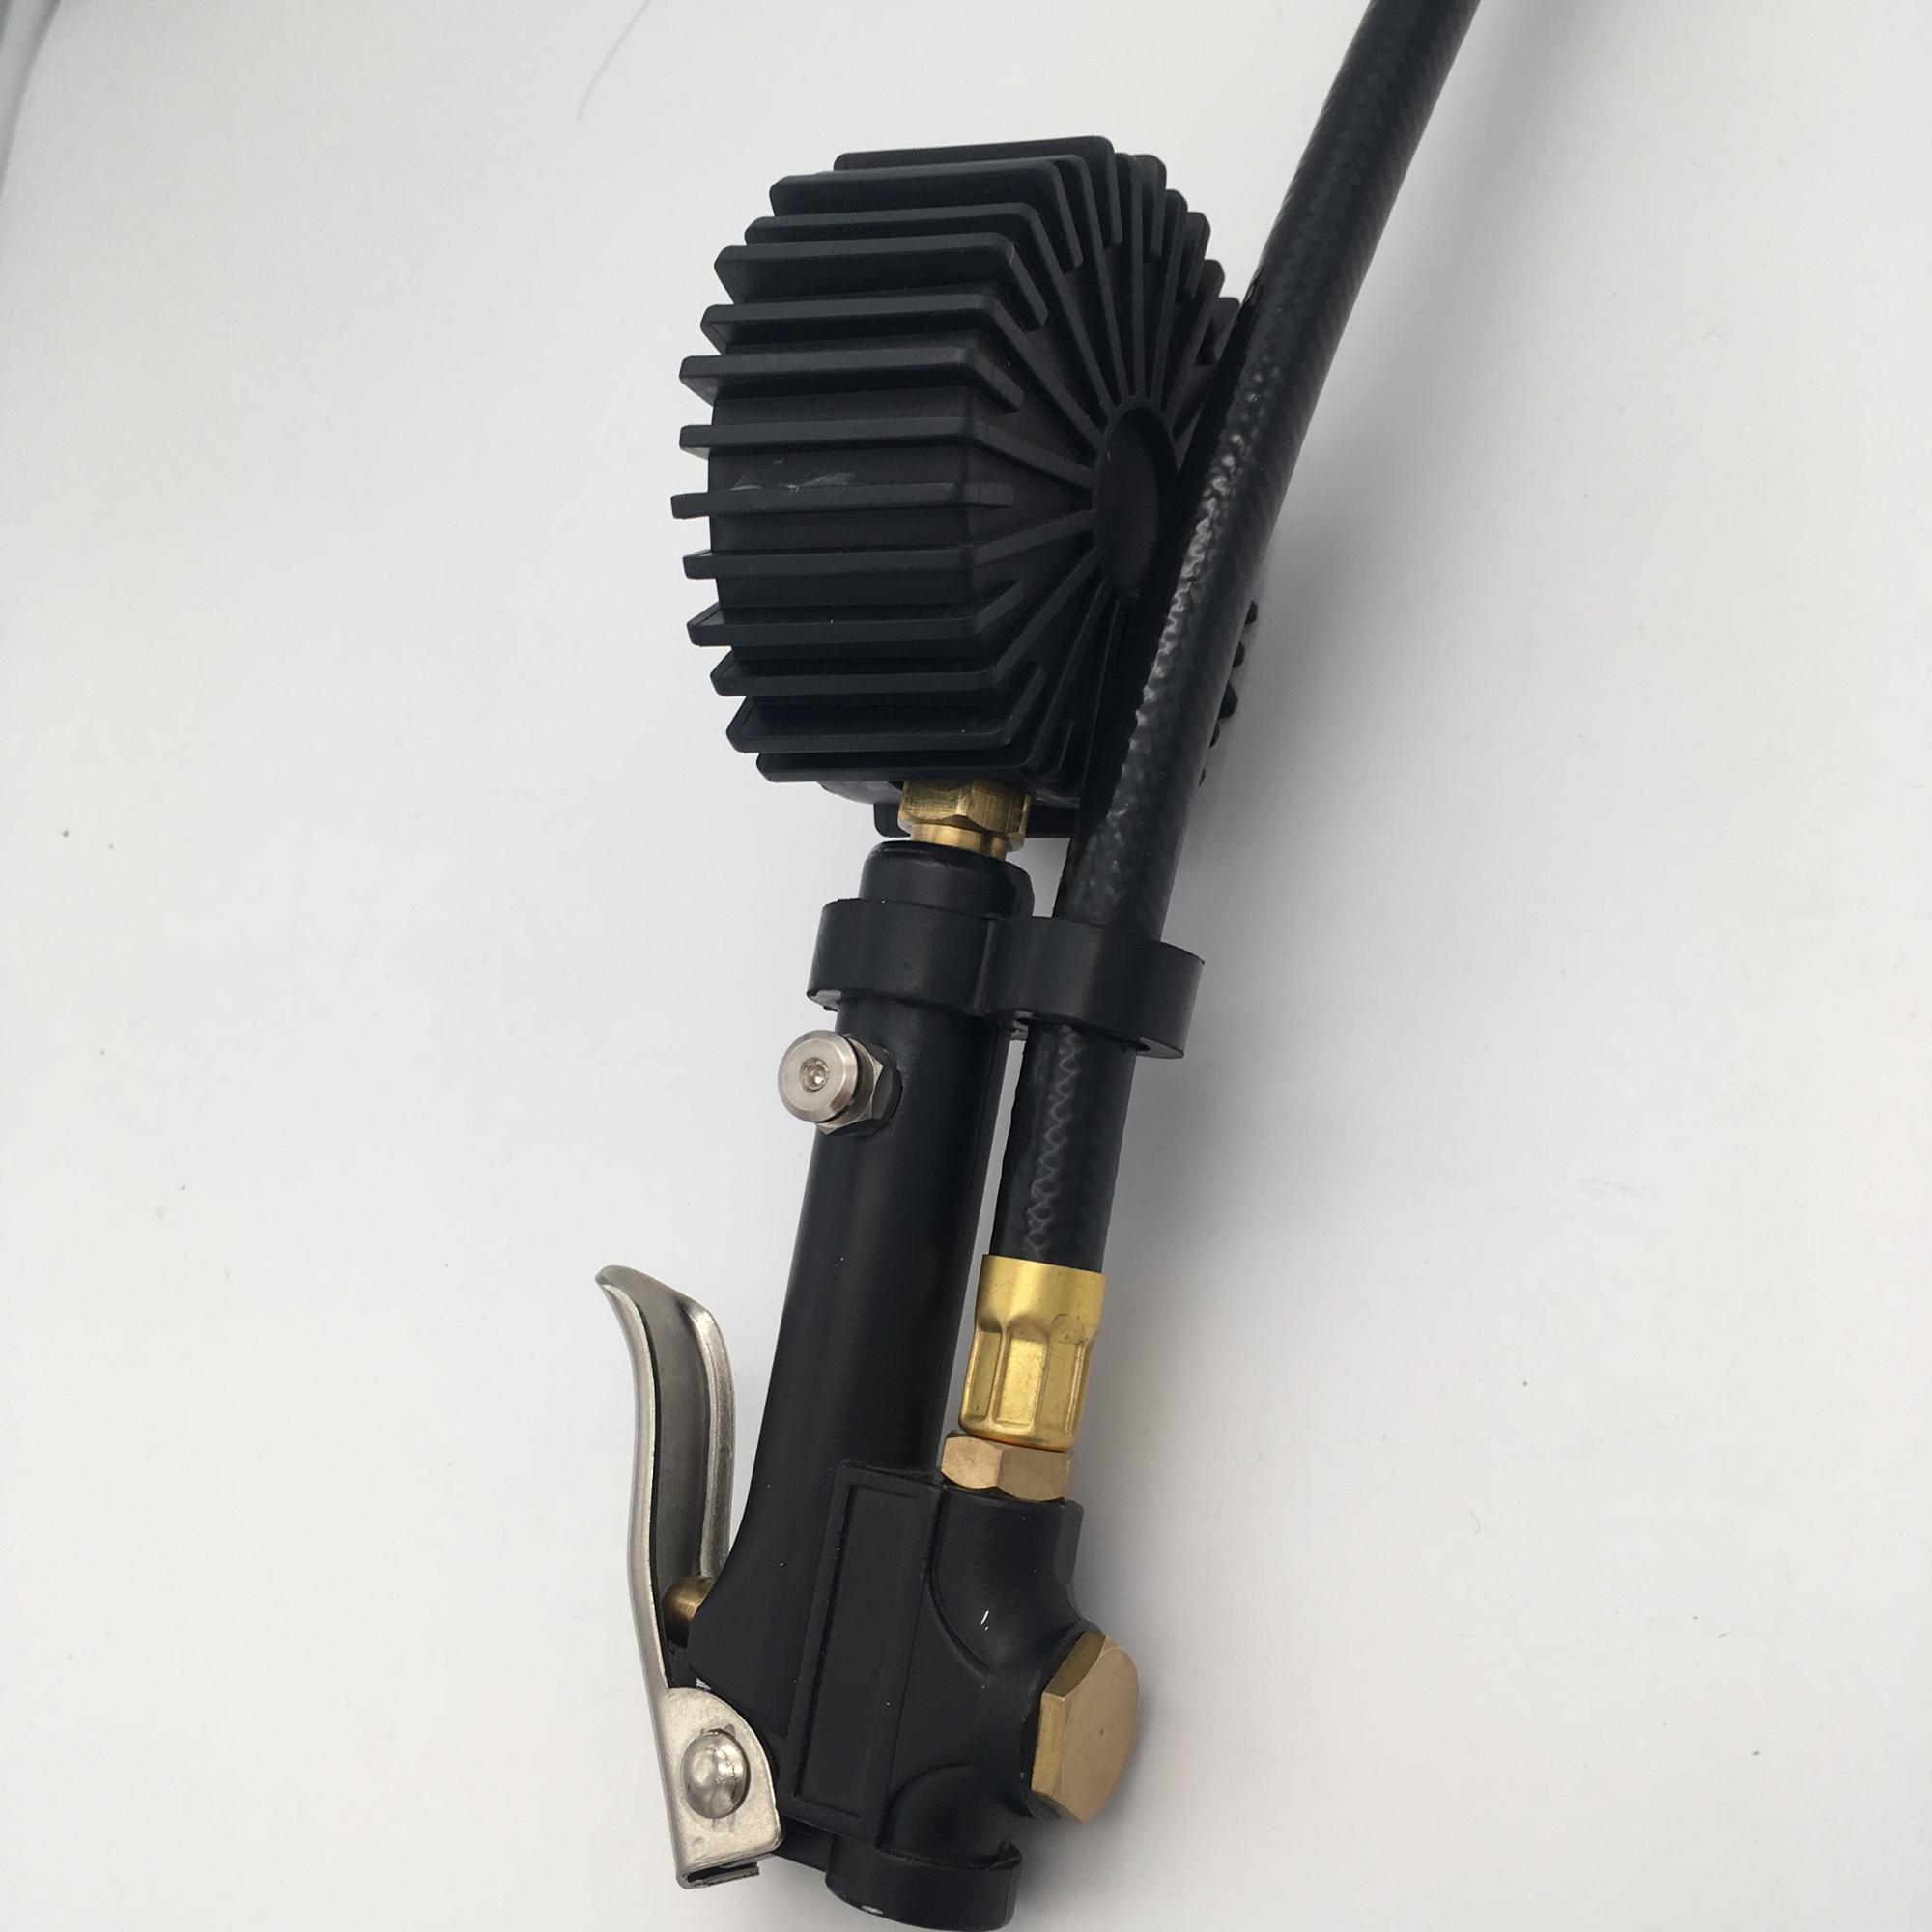 New Models Digital Tire Inflator Gun